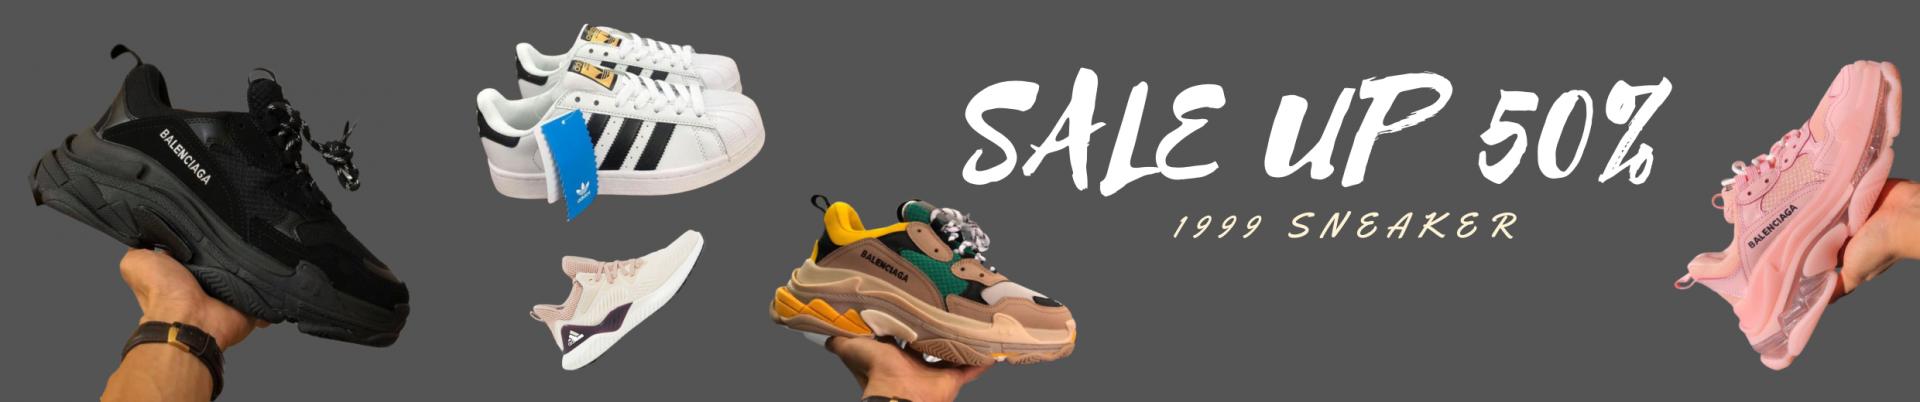 https://giaysneaker.com.vn/public/media//sale-up-50.png